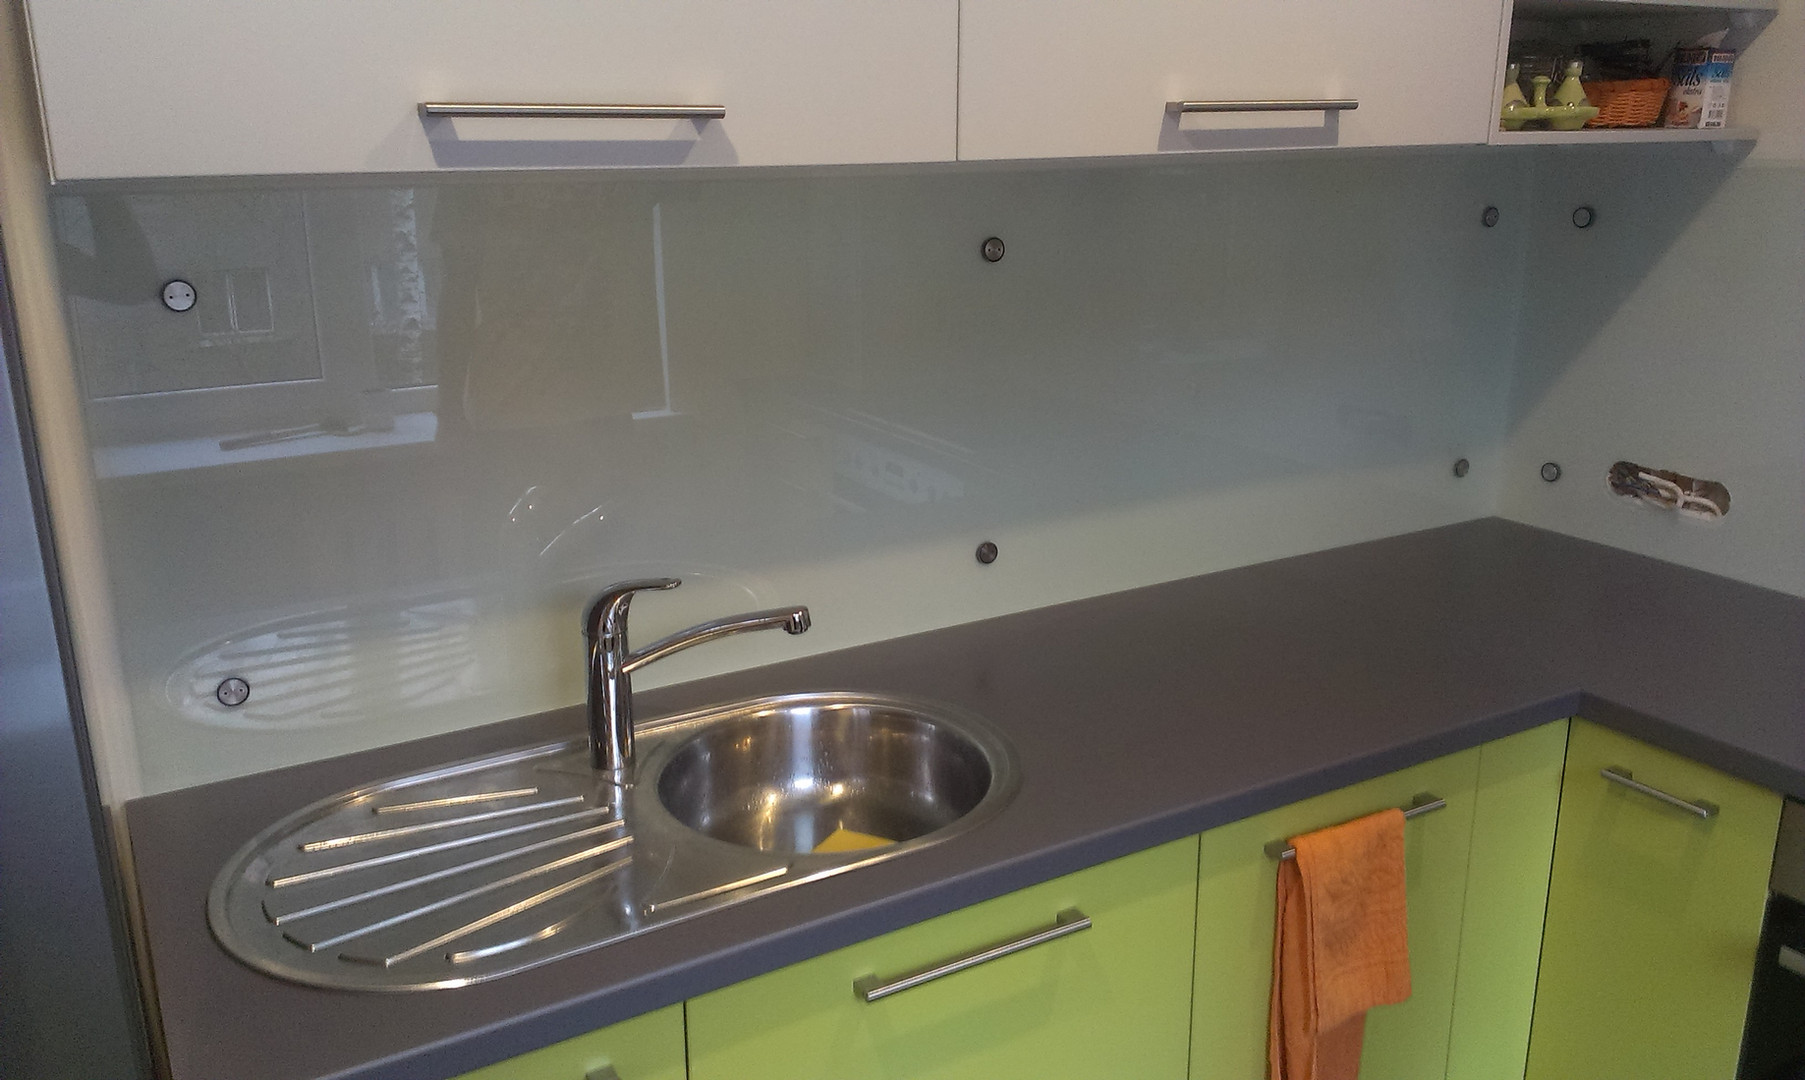 Matēts virtuves panelis